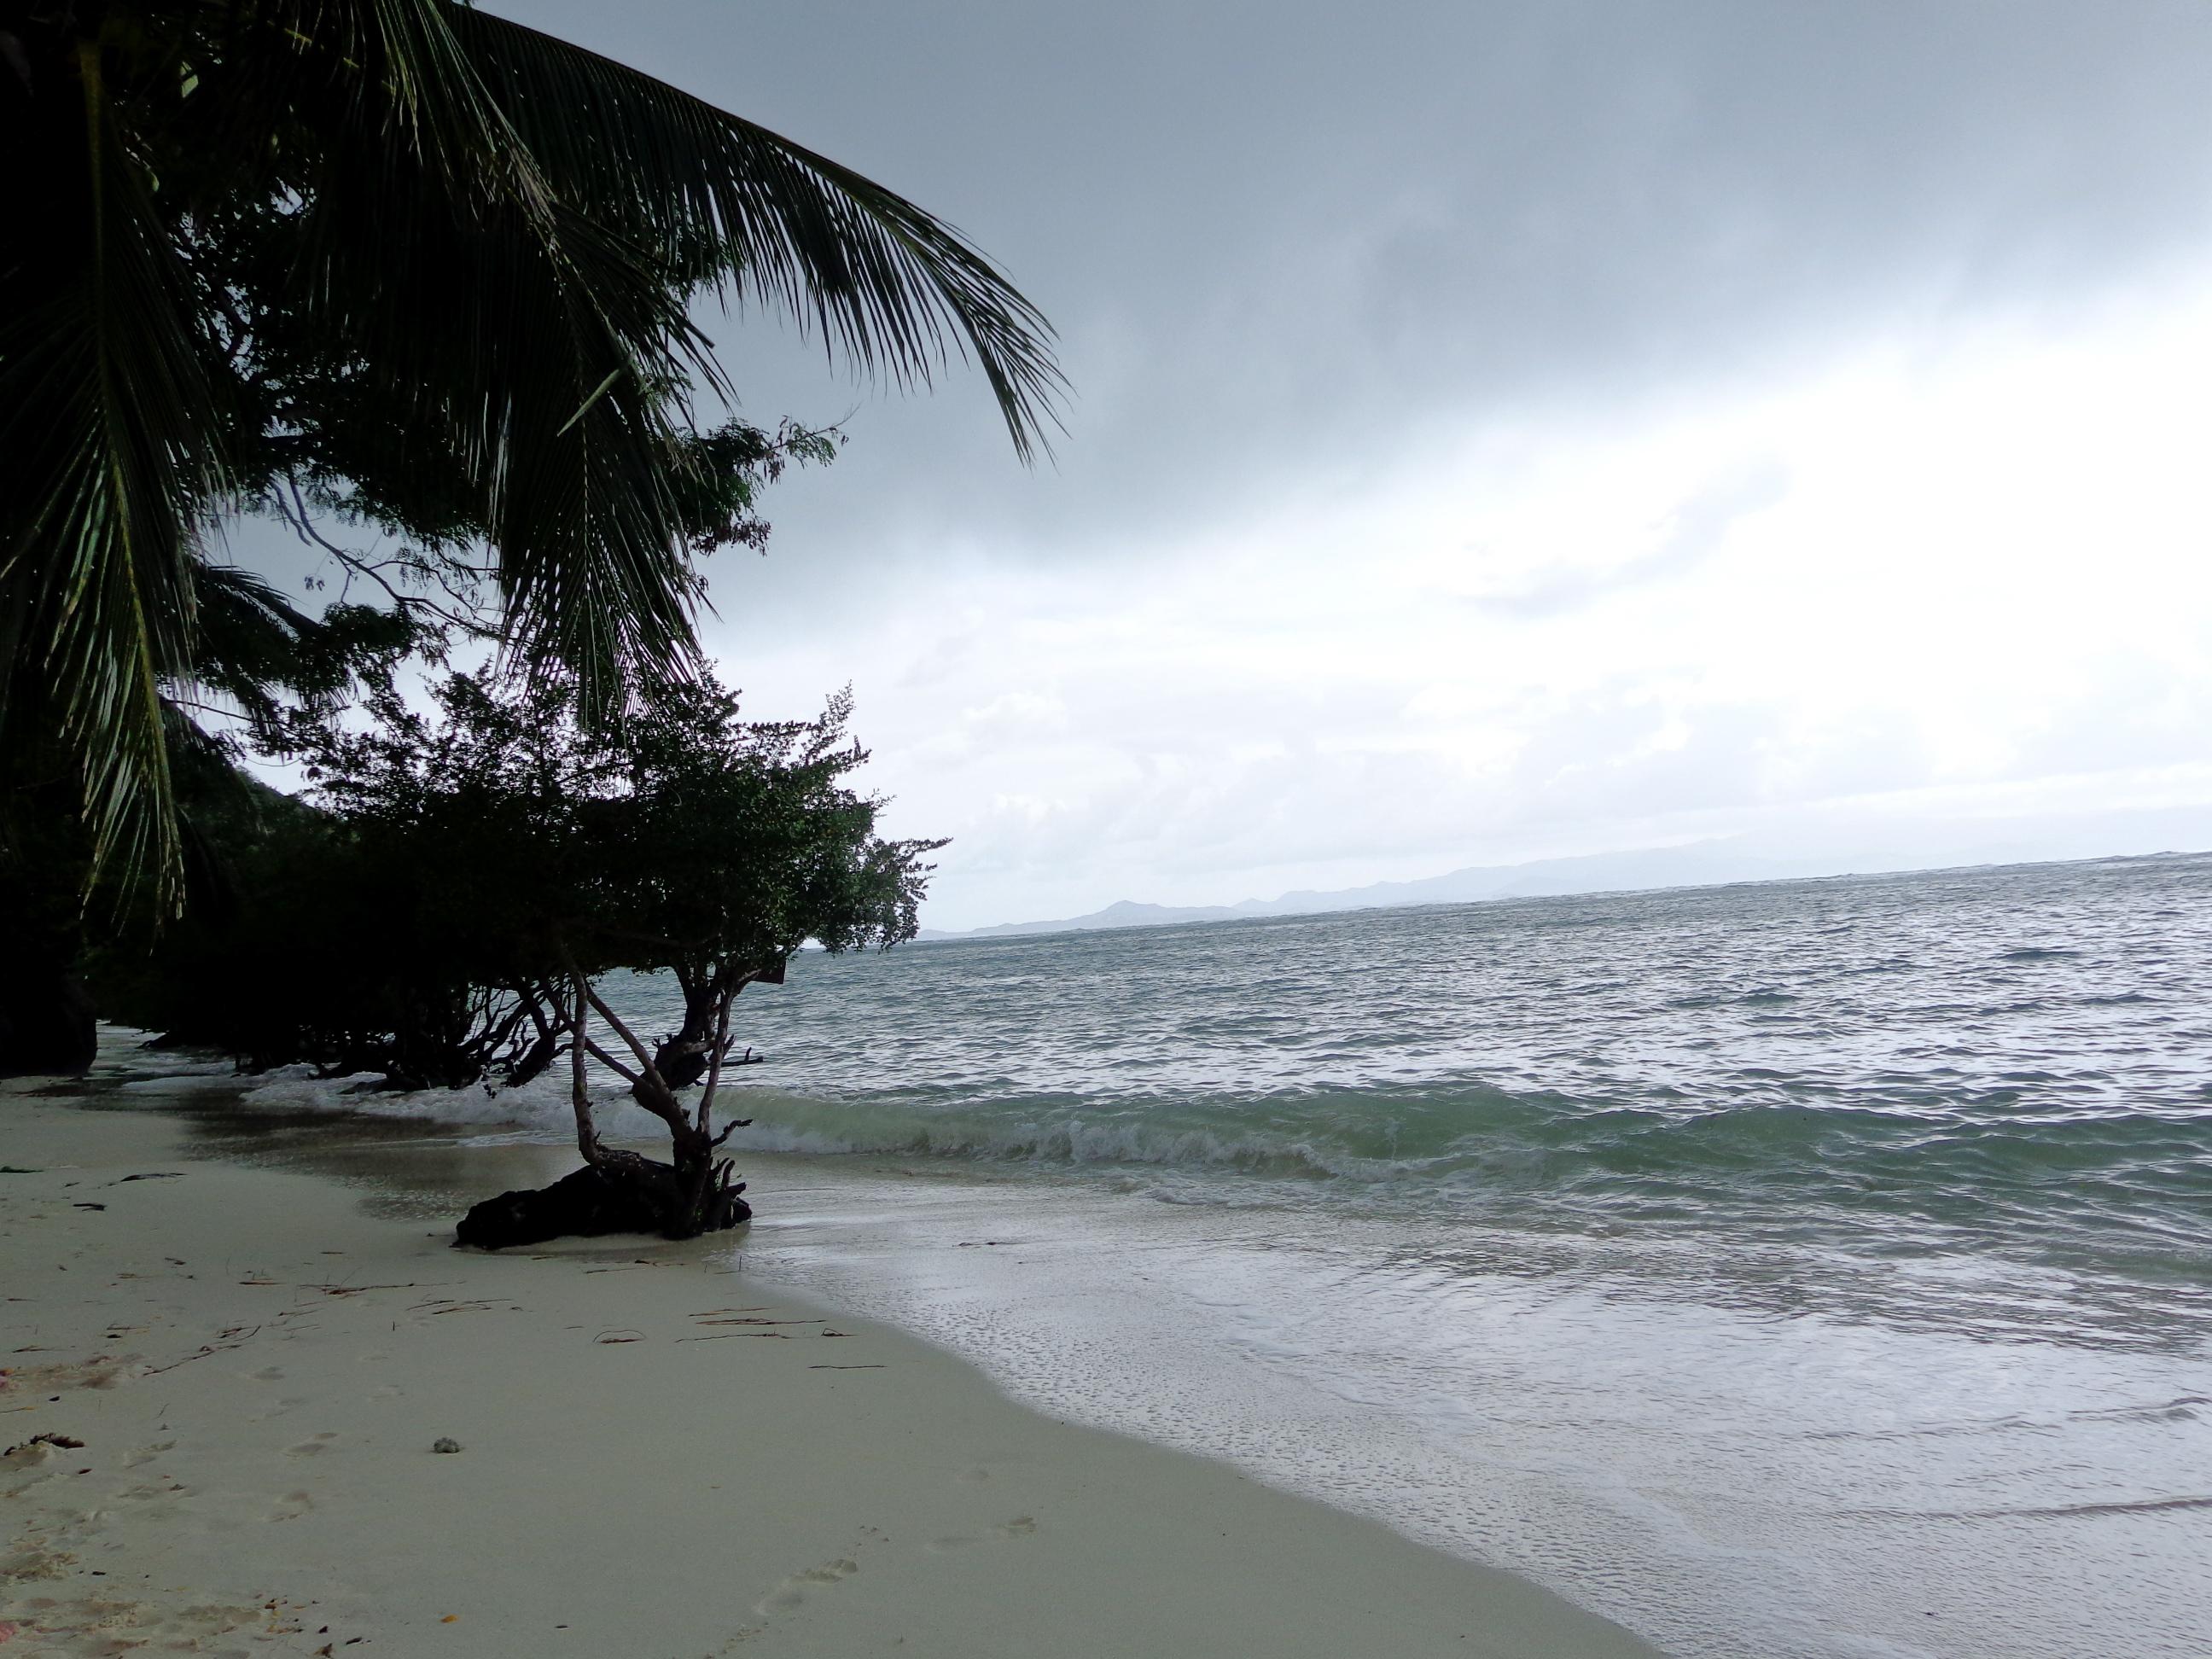 Stormy Koh Phangan